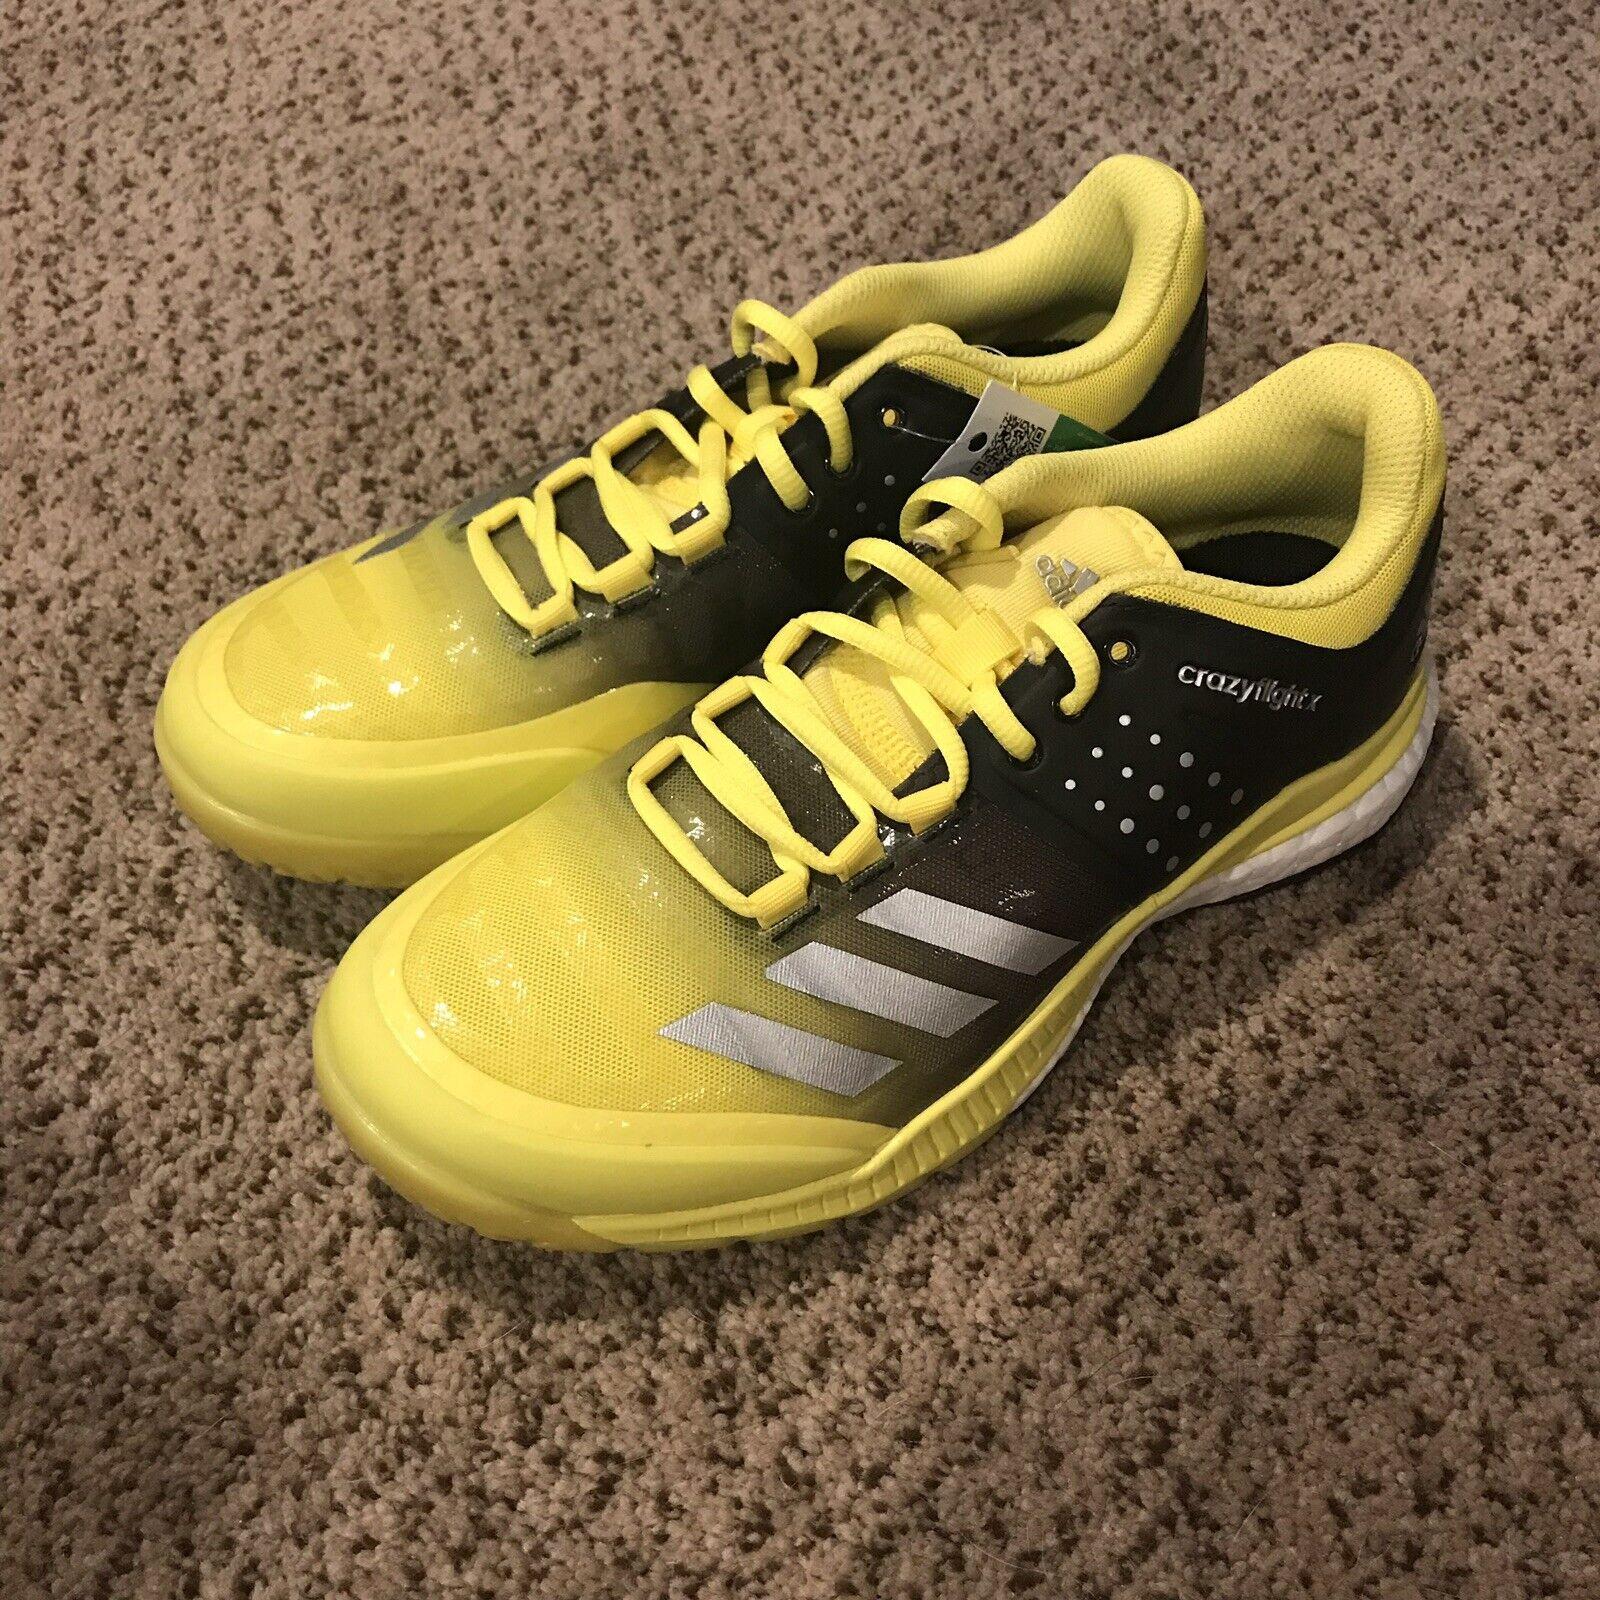 Adidas Women's Crazyflight X Volleyball shoes BA9267 Size Size Size 6.5 3d146c